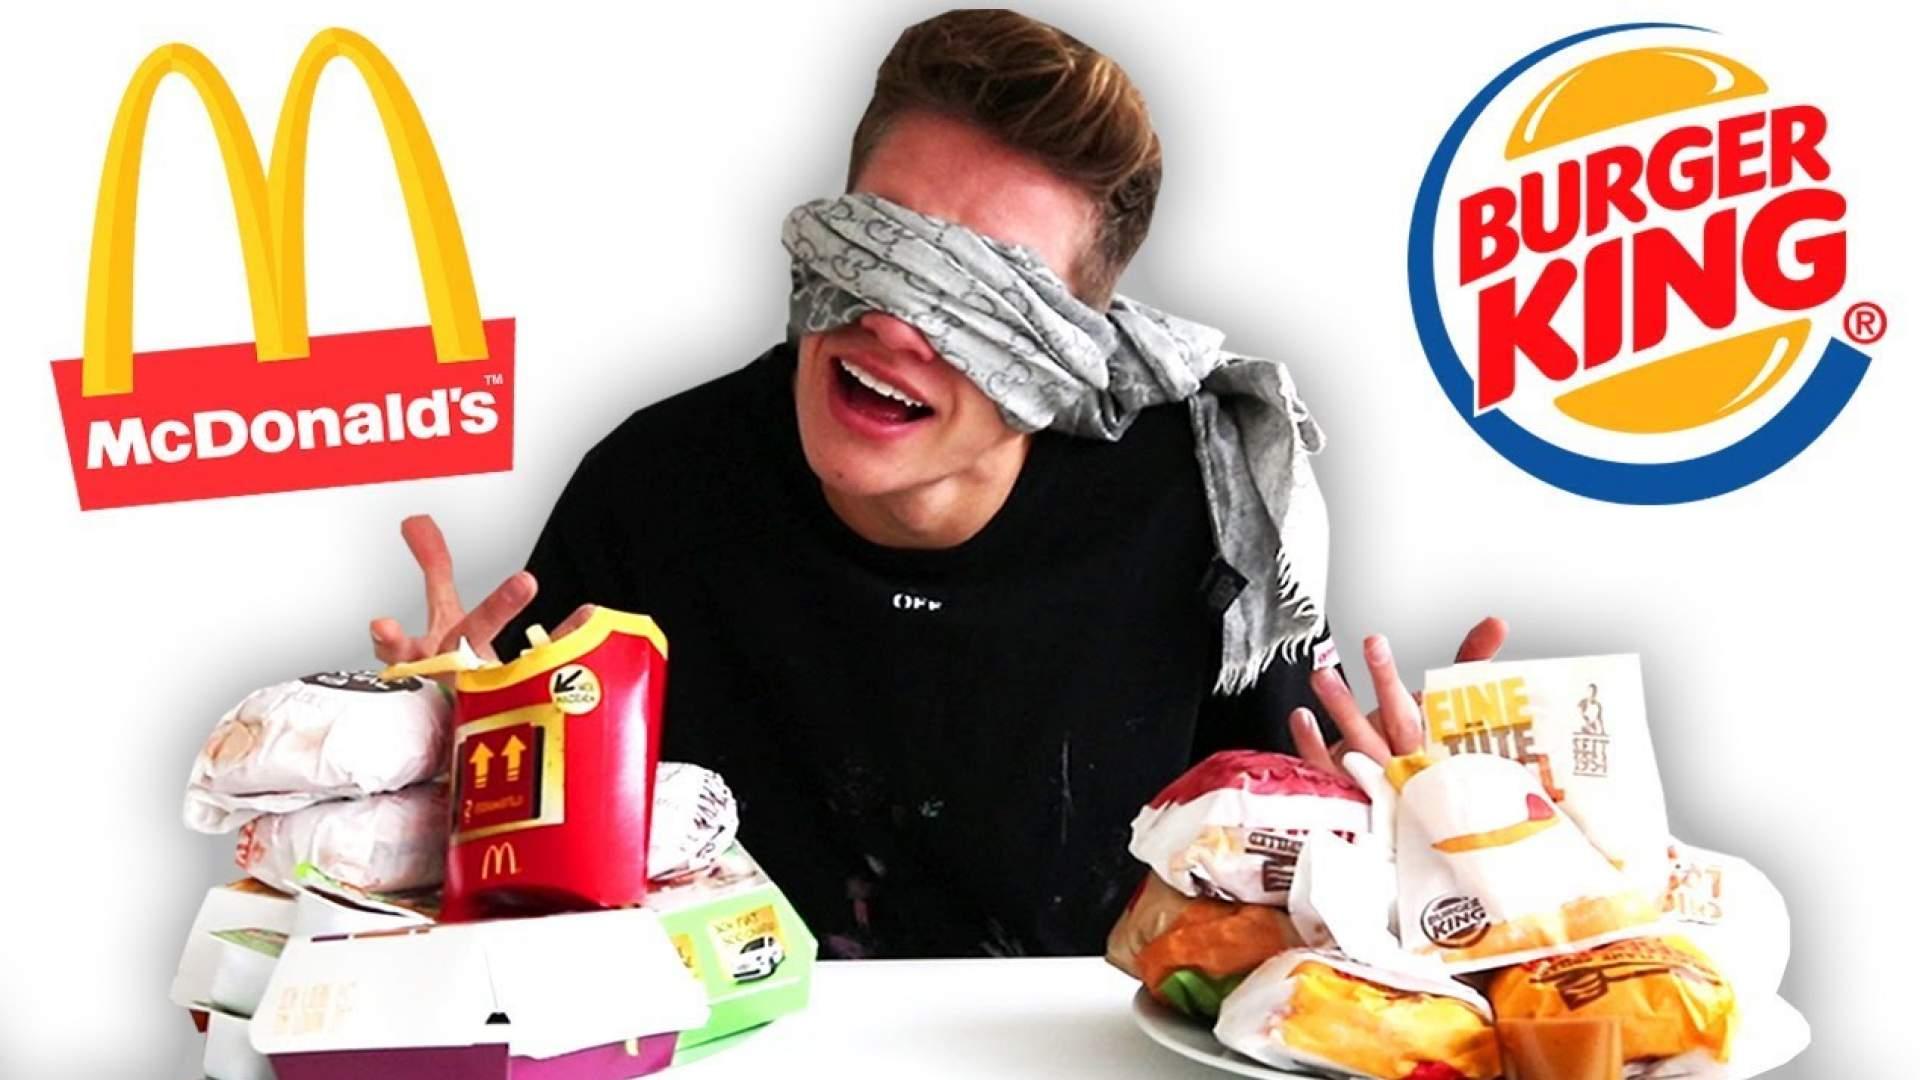 VIDEO: 'McDonalds' vs 'Burger King' blind erraten! Das Ende kommt überraschend!